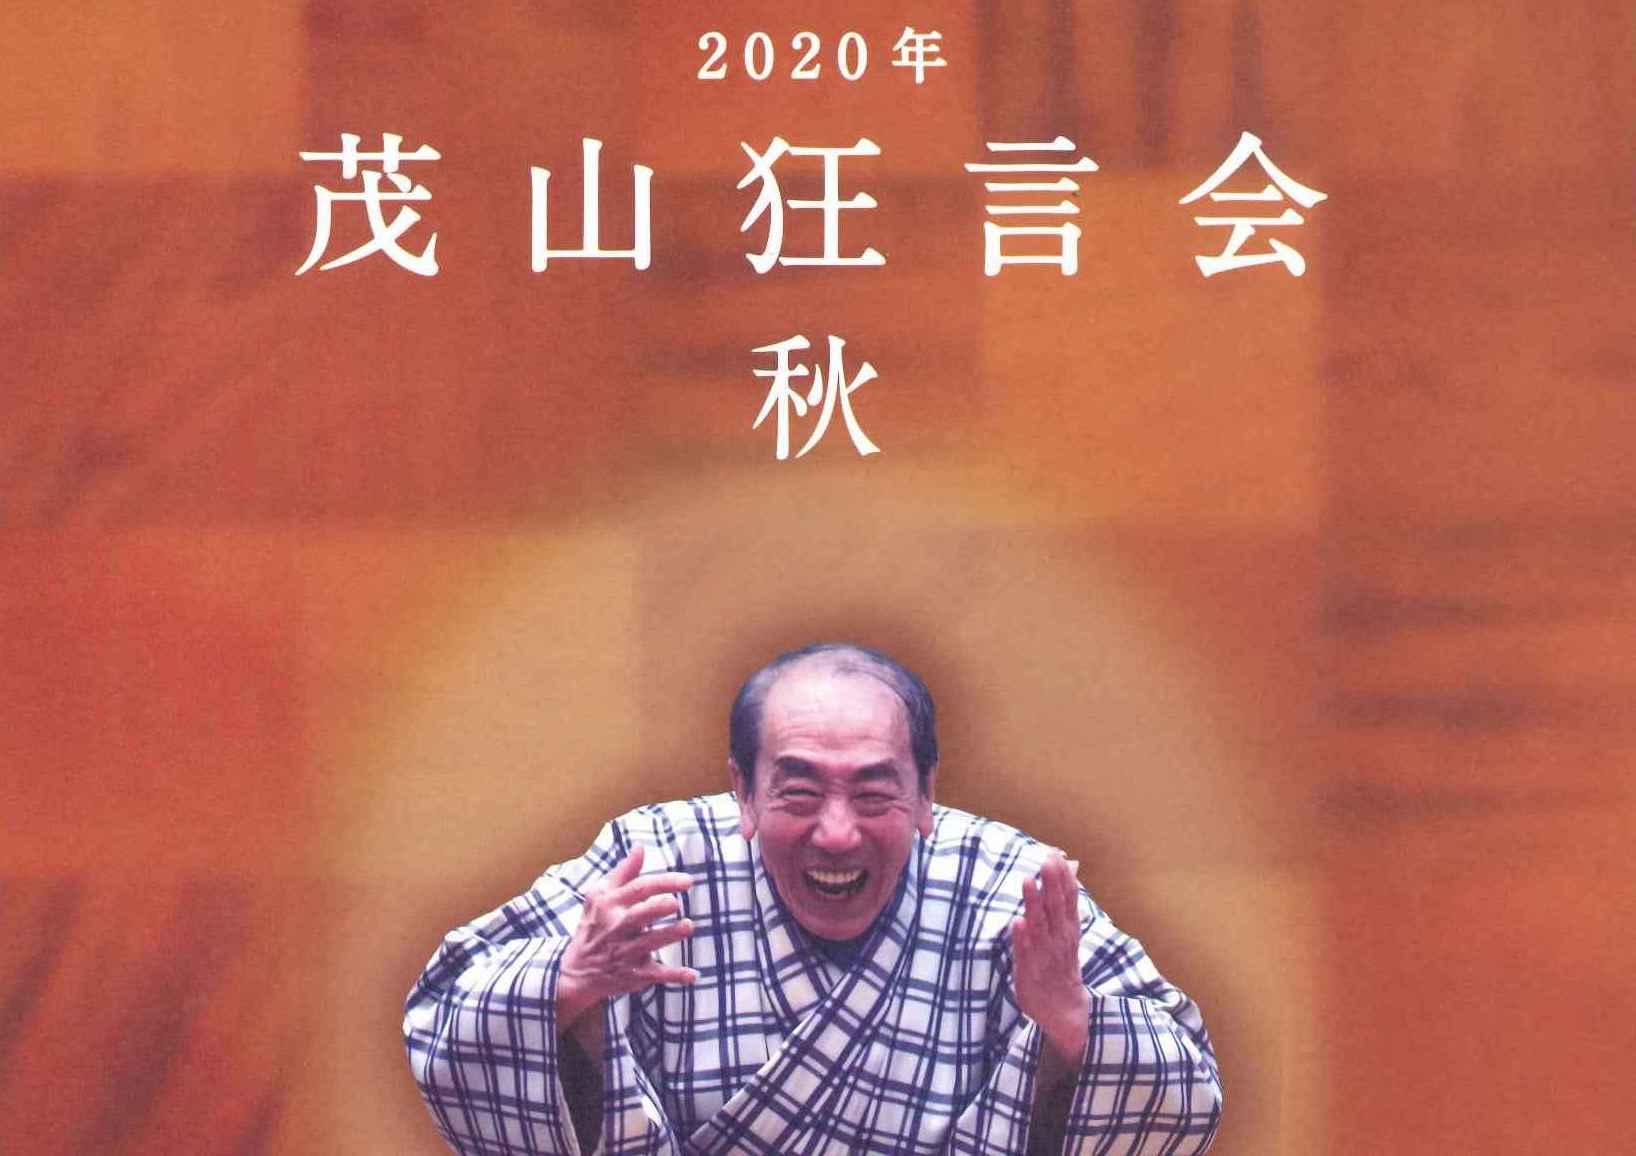 9/22(火祝)「茂山狂言会 秋〜五世茂山千作 一周忌追善公演〜」追加公演について